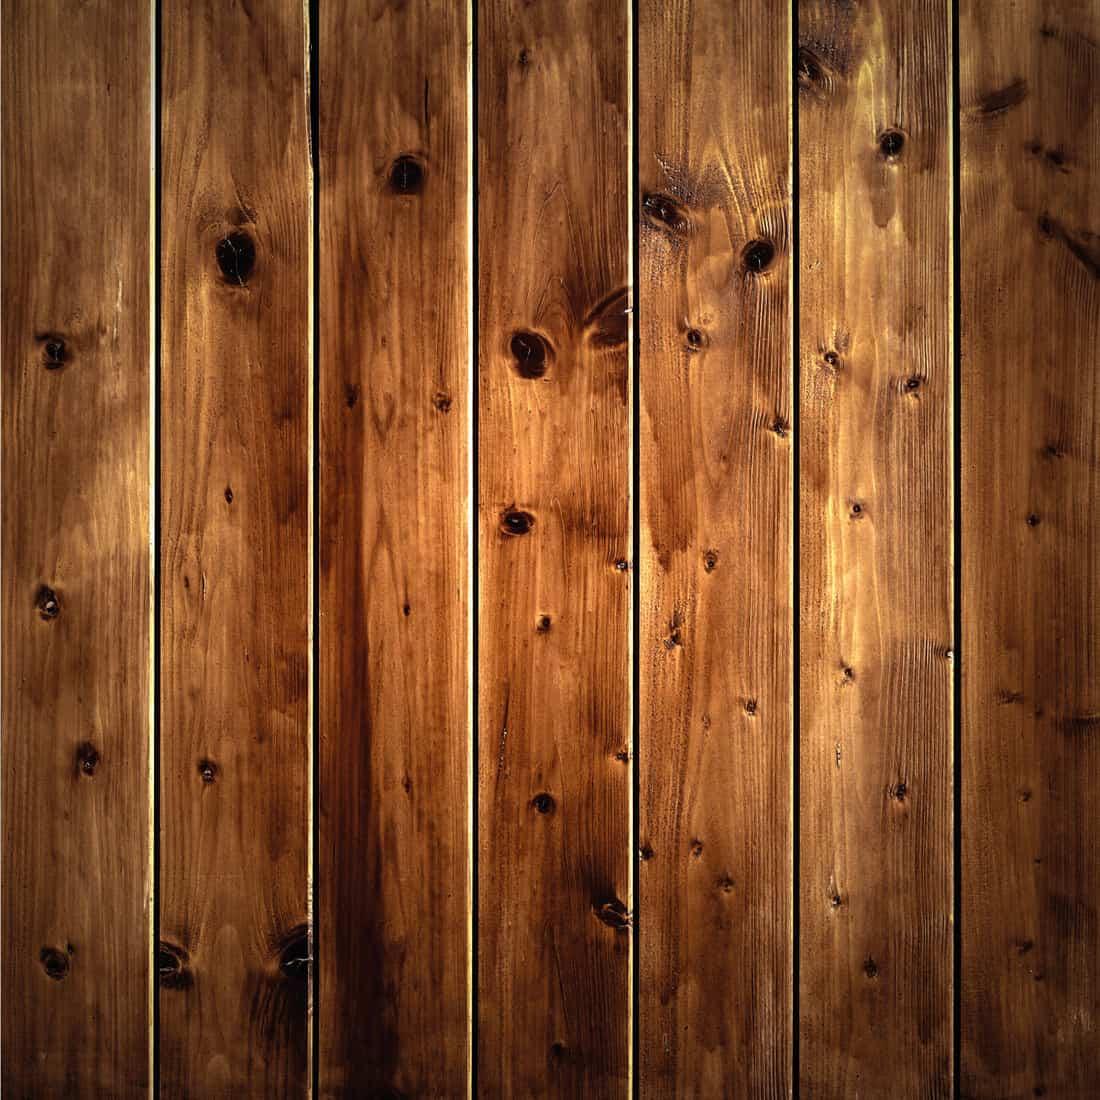 Varnished wood wall panels